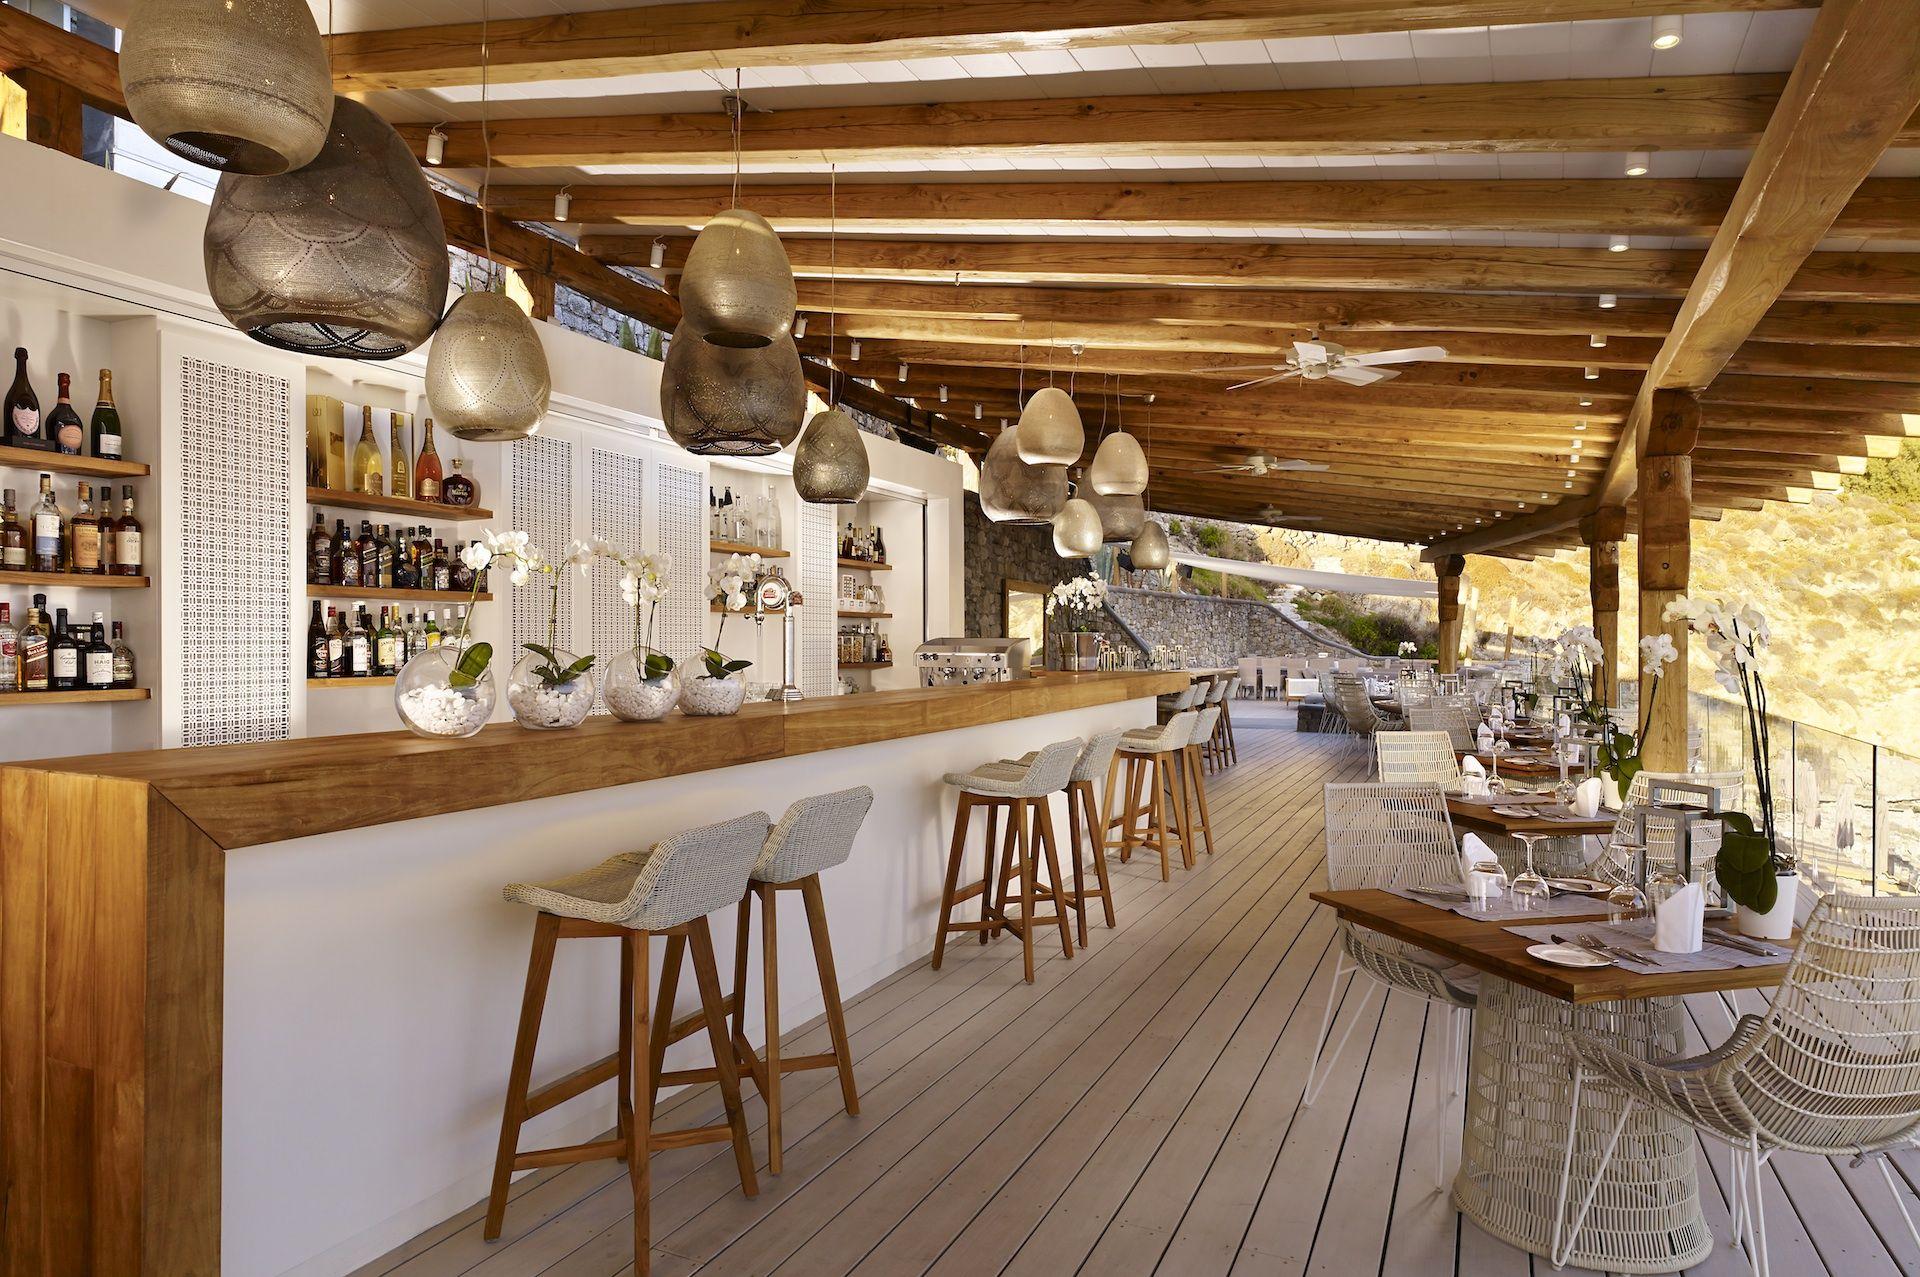 Greece Beach Bars Bayview Beach Restaurant Bar Santa